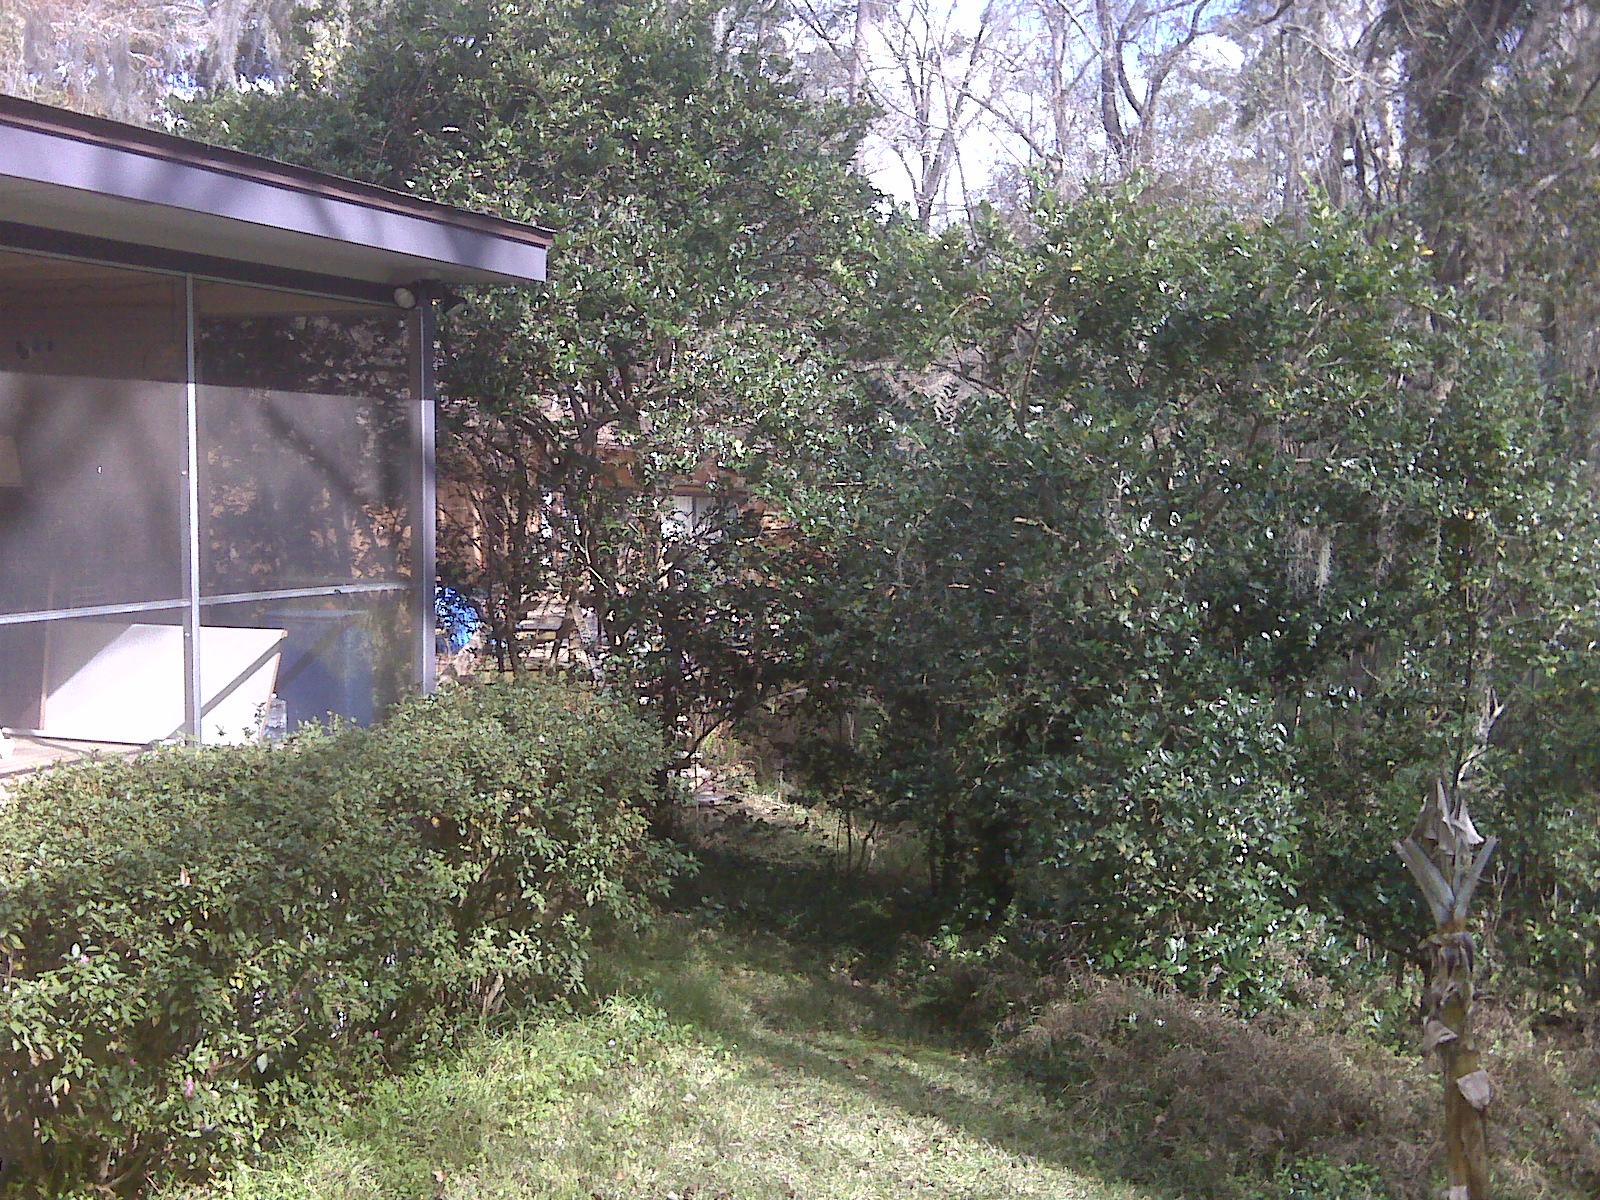 backyard at Kiki's Mom and Stepdad's home